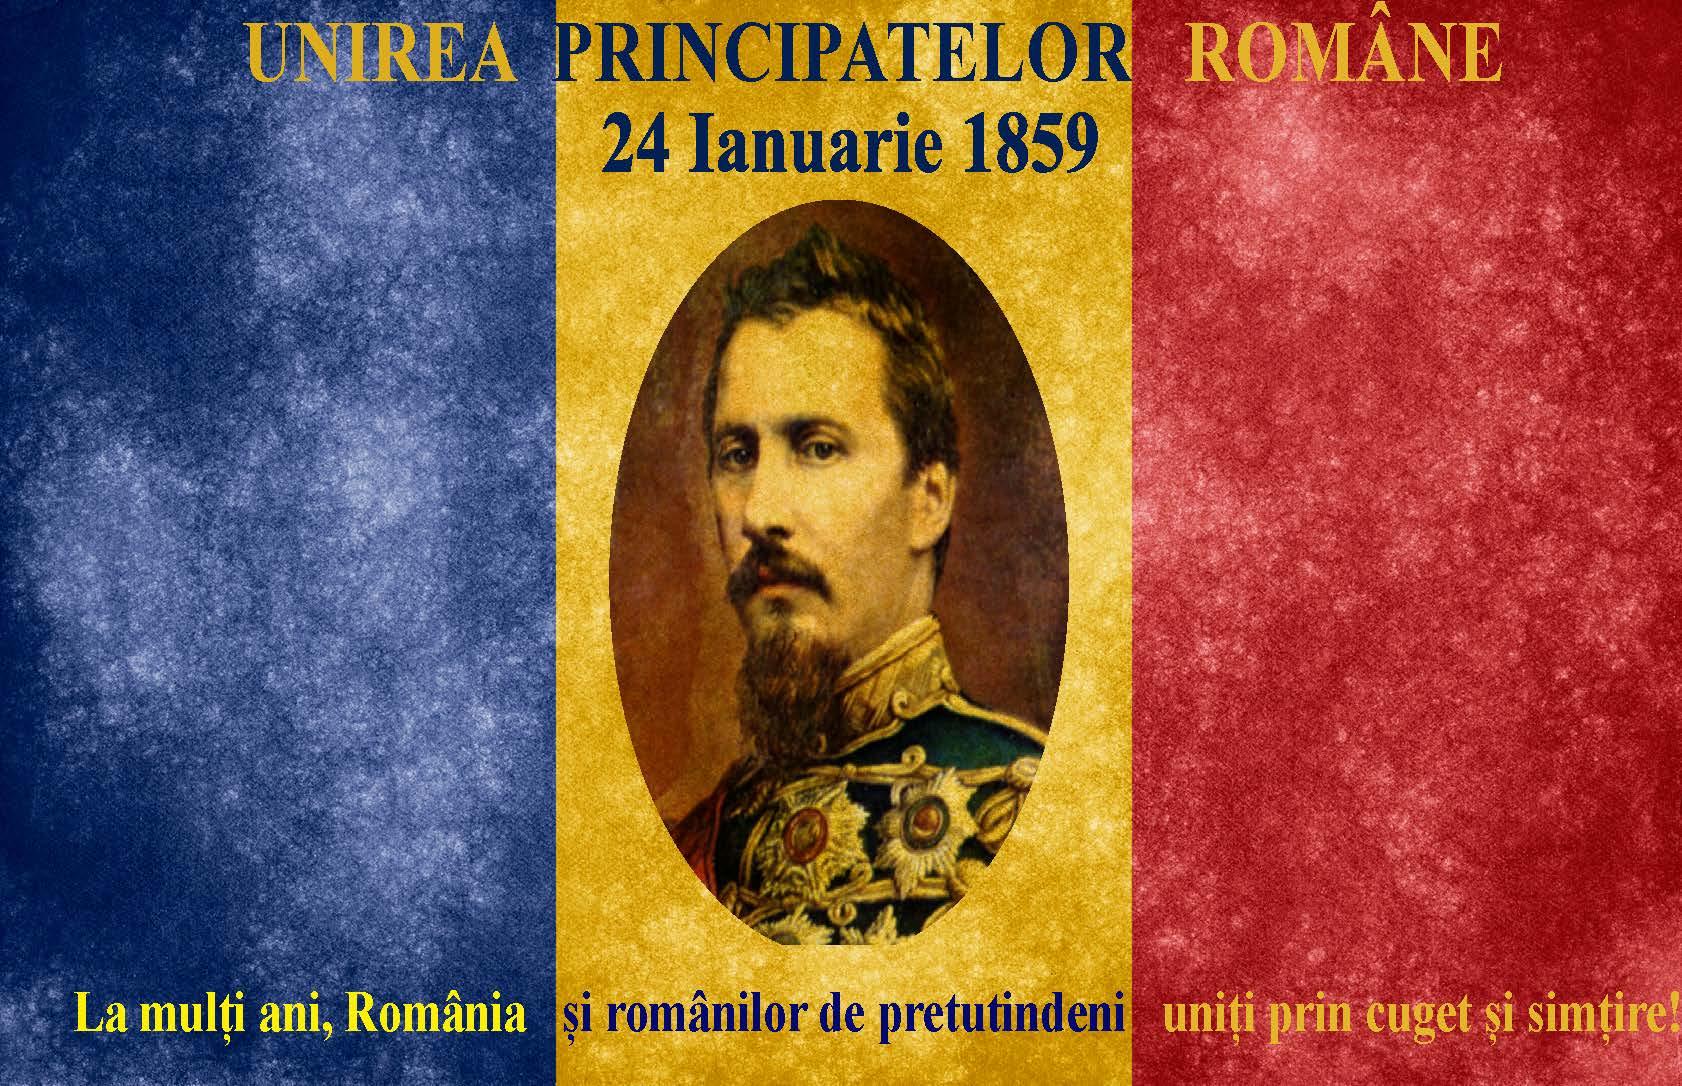 159 de ani de la Unirea Principatelor Române – Mesajul Rectorului